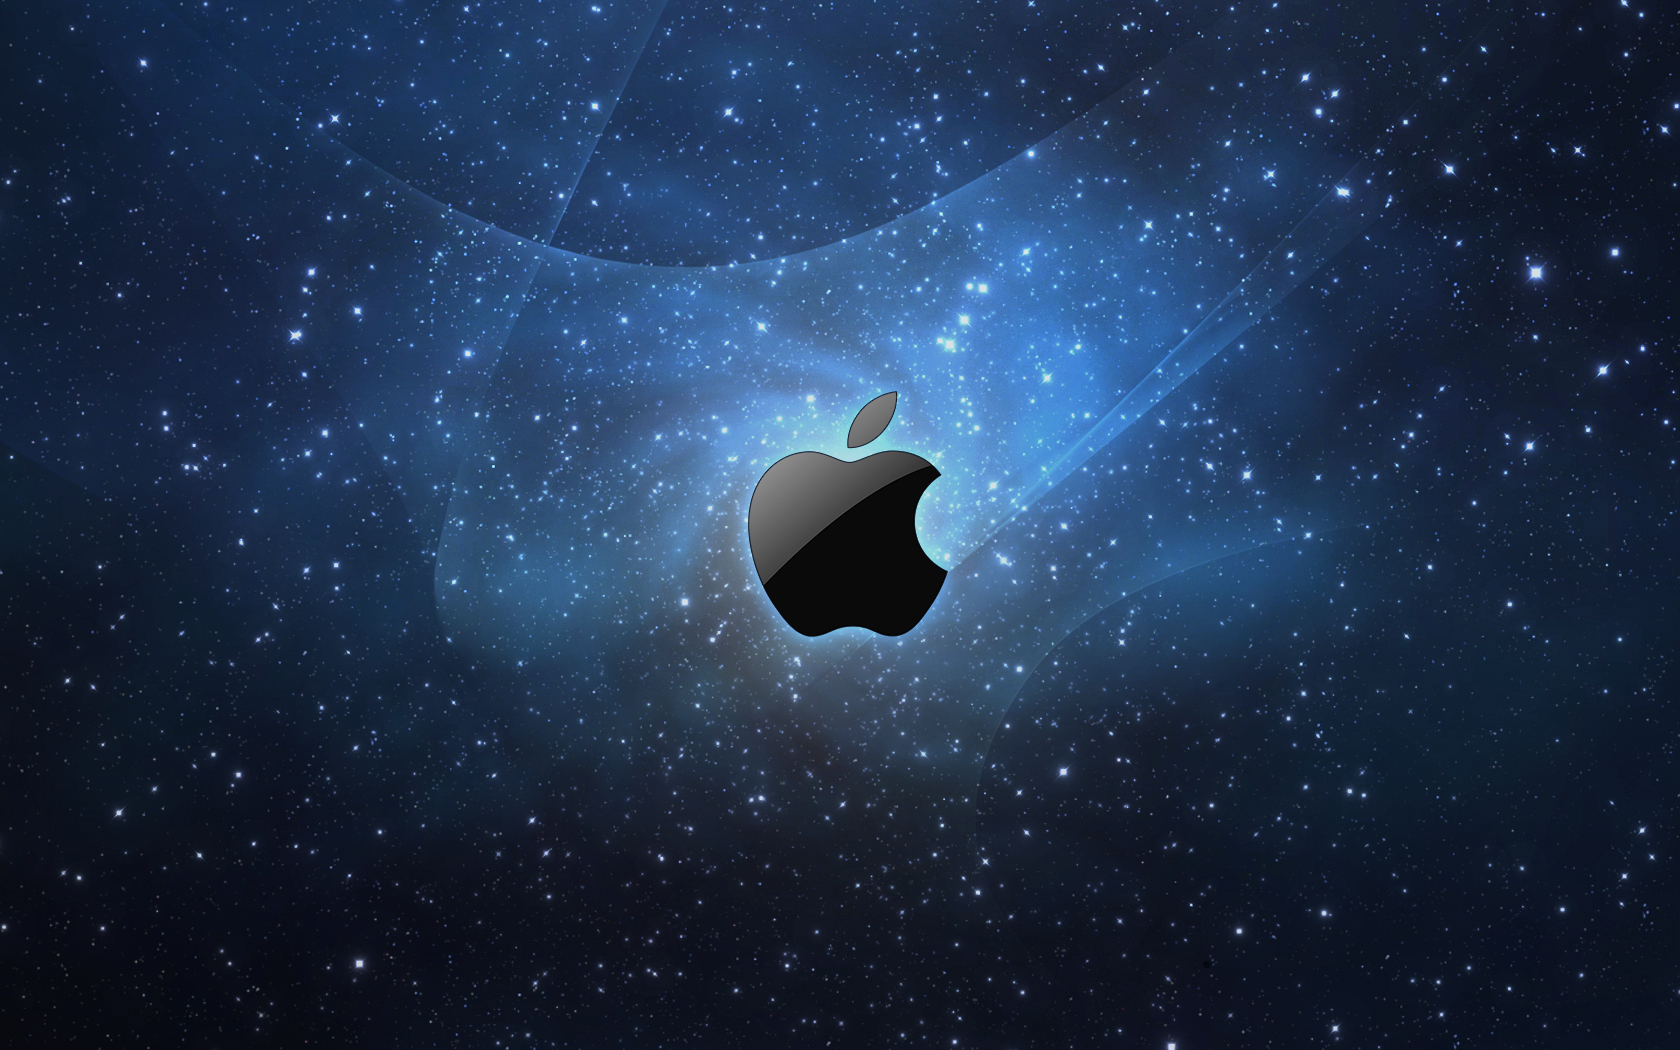 1680x1050 Stars and Apple desktop PC and Mac wallpaper 1680x1050